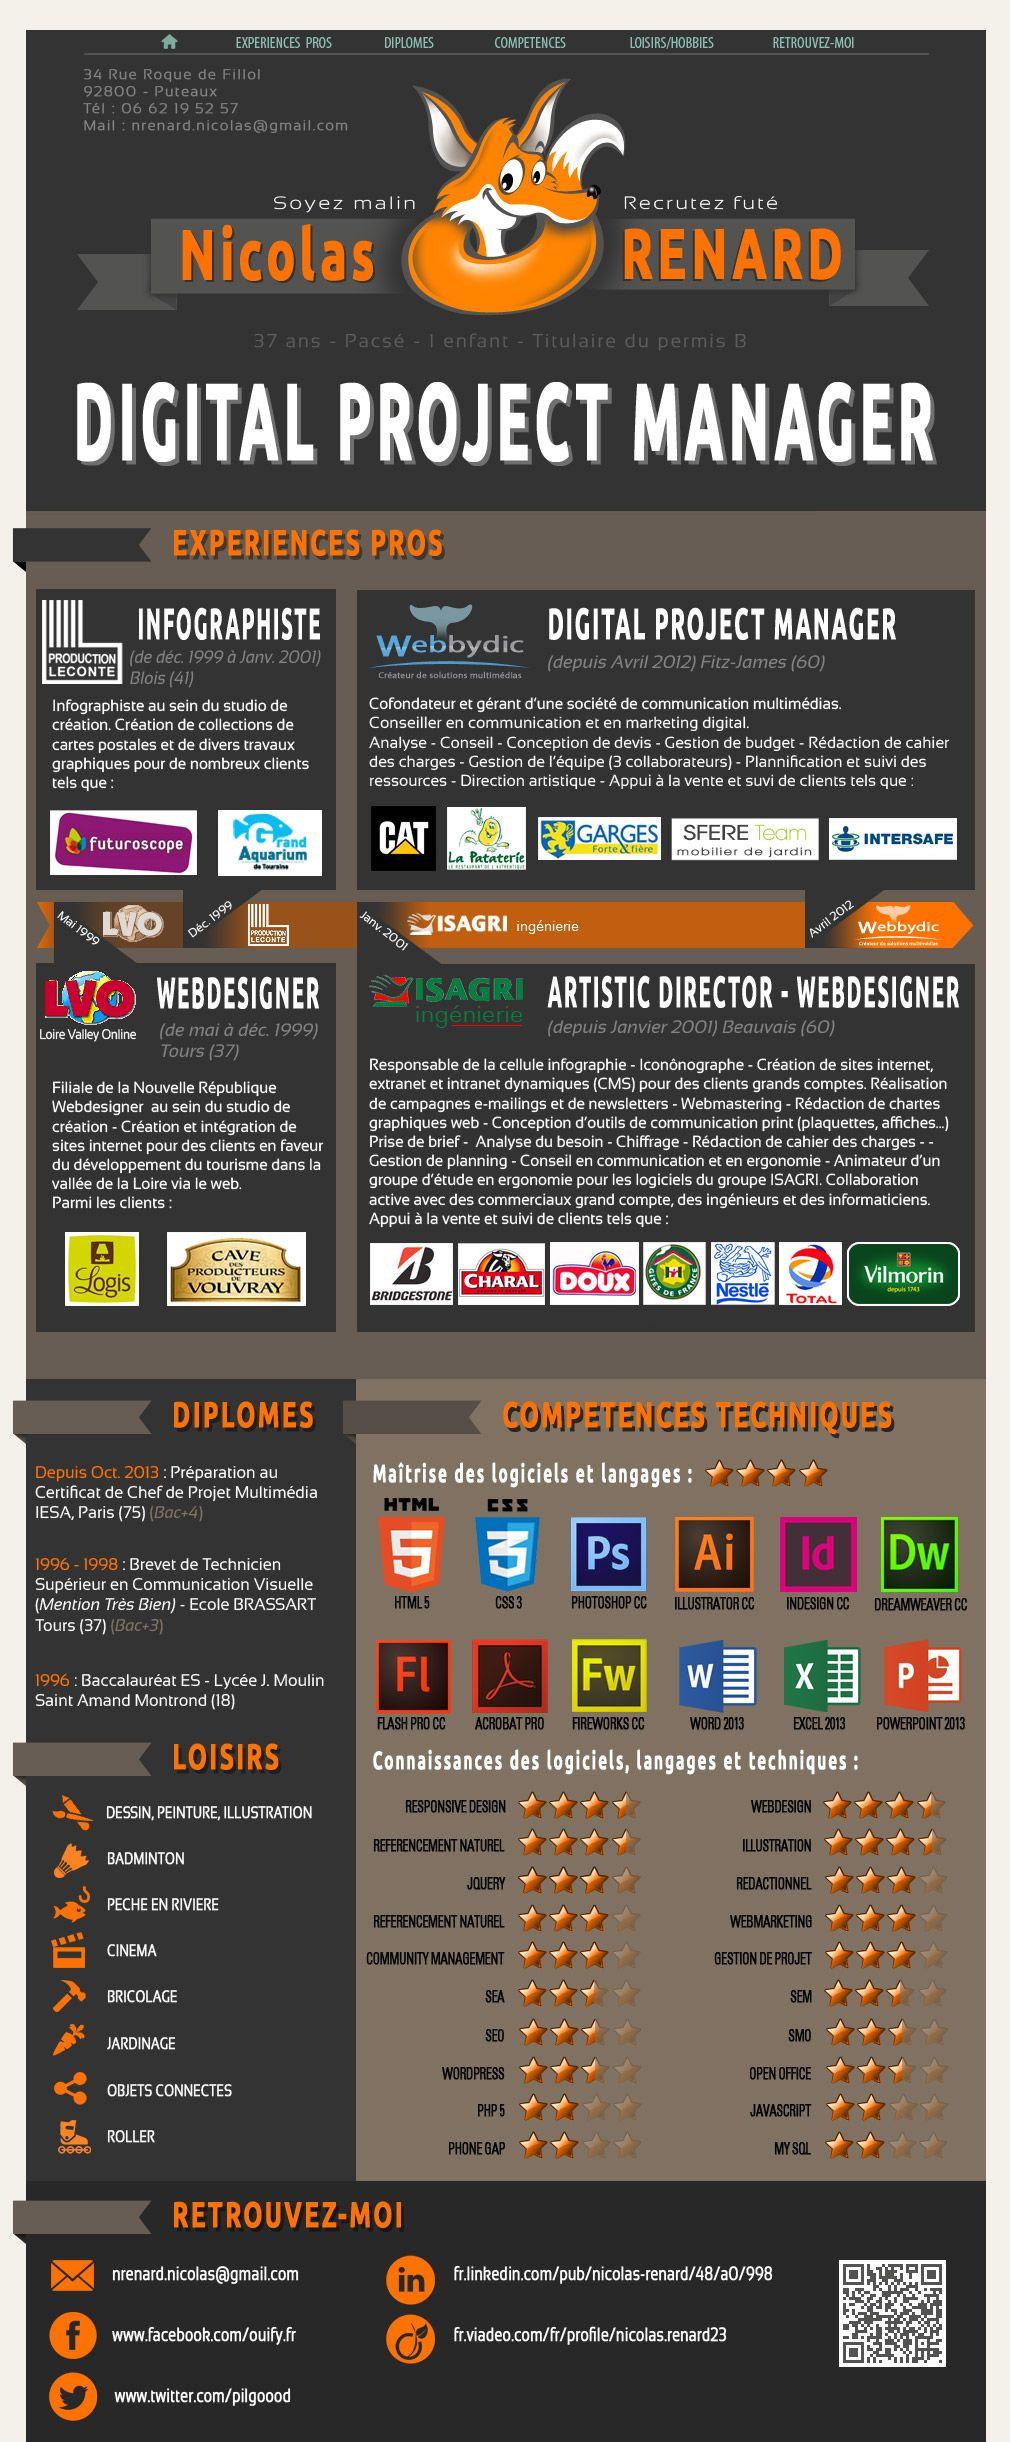 Epingle Par Nicolas Renard Sur Nicolas Renard Chef De Projet Digital Idee Cv Infographiste